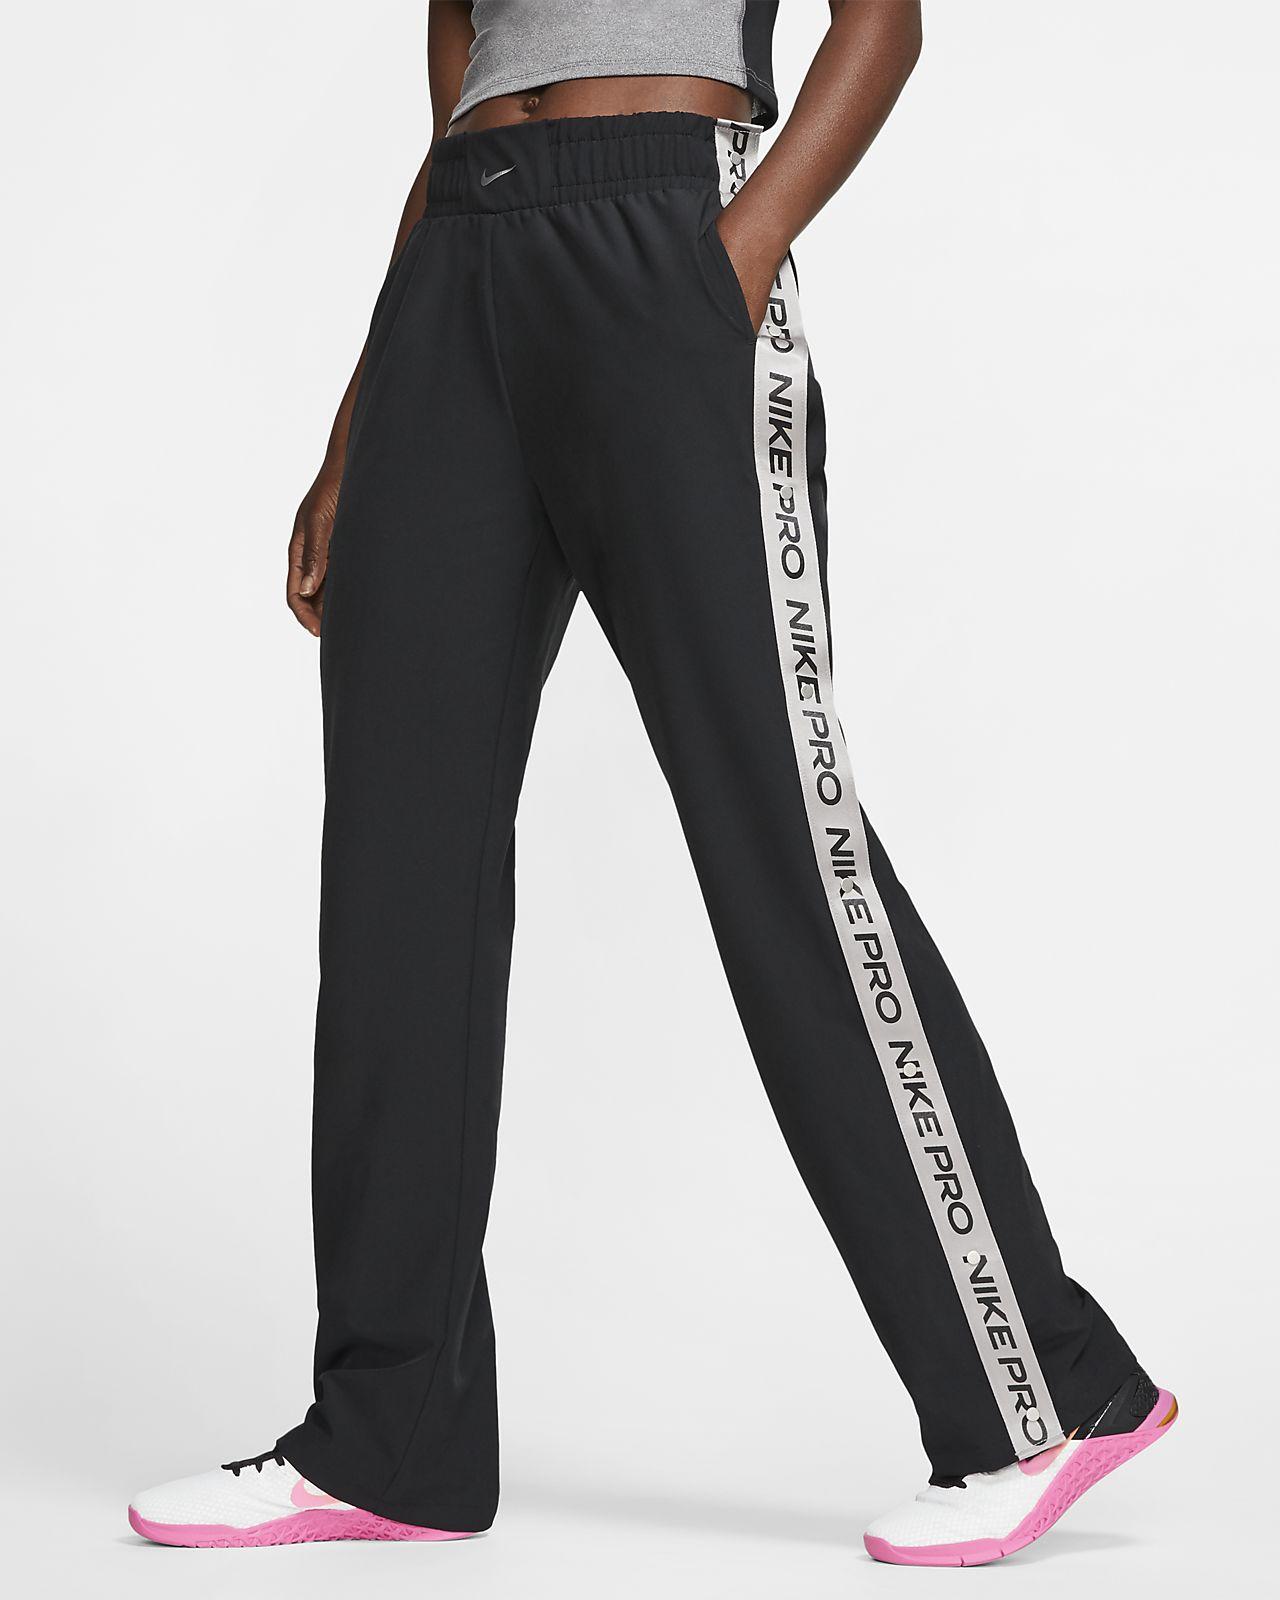 Pantaloni Tear-Away Nike Pro - Donna